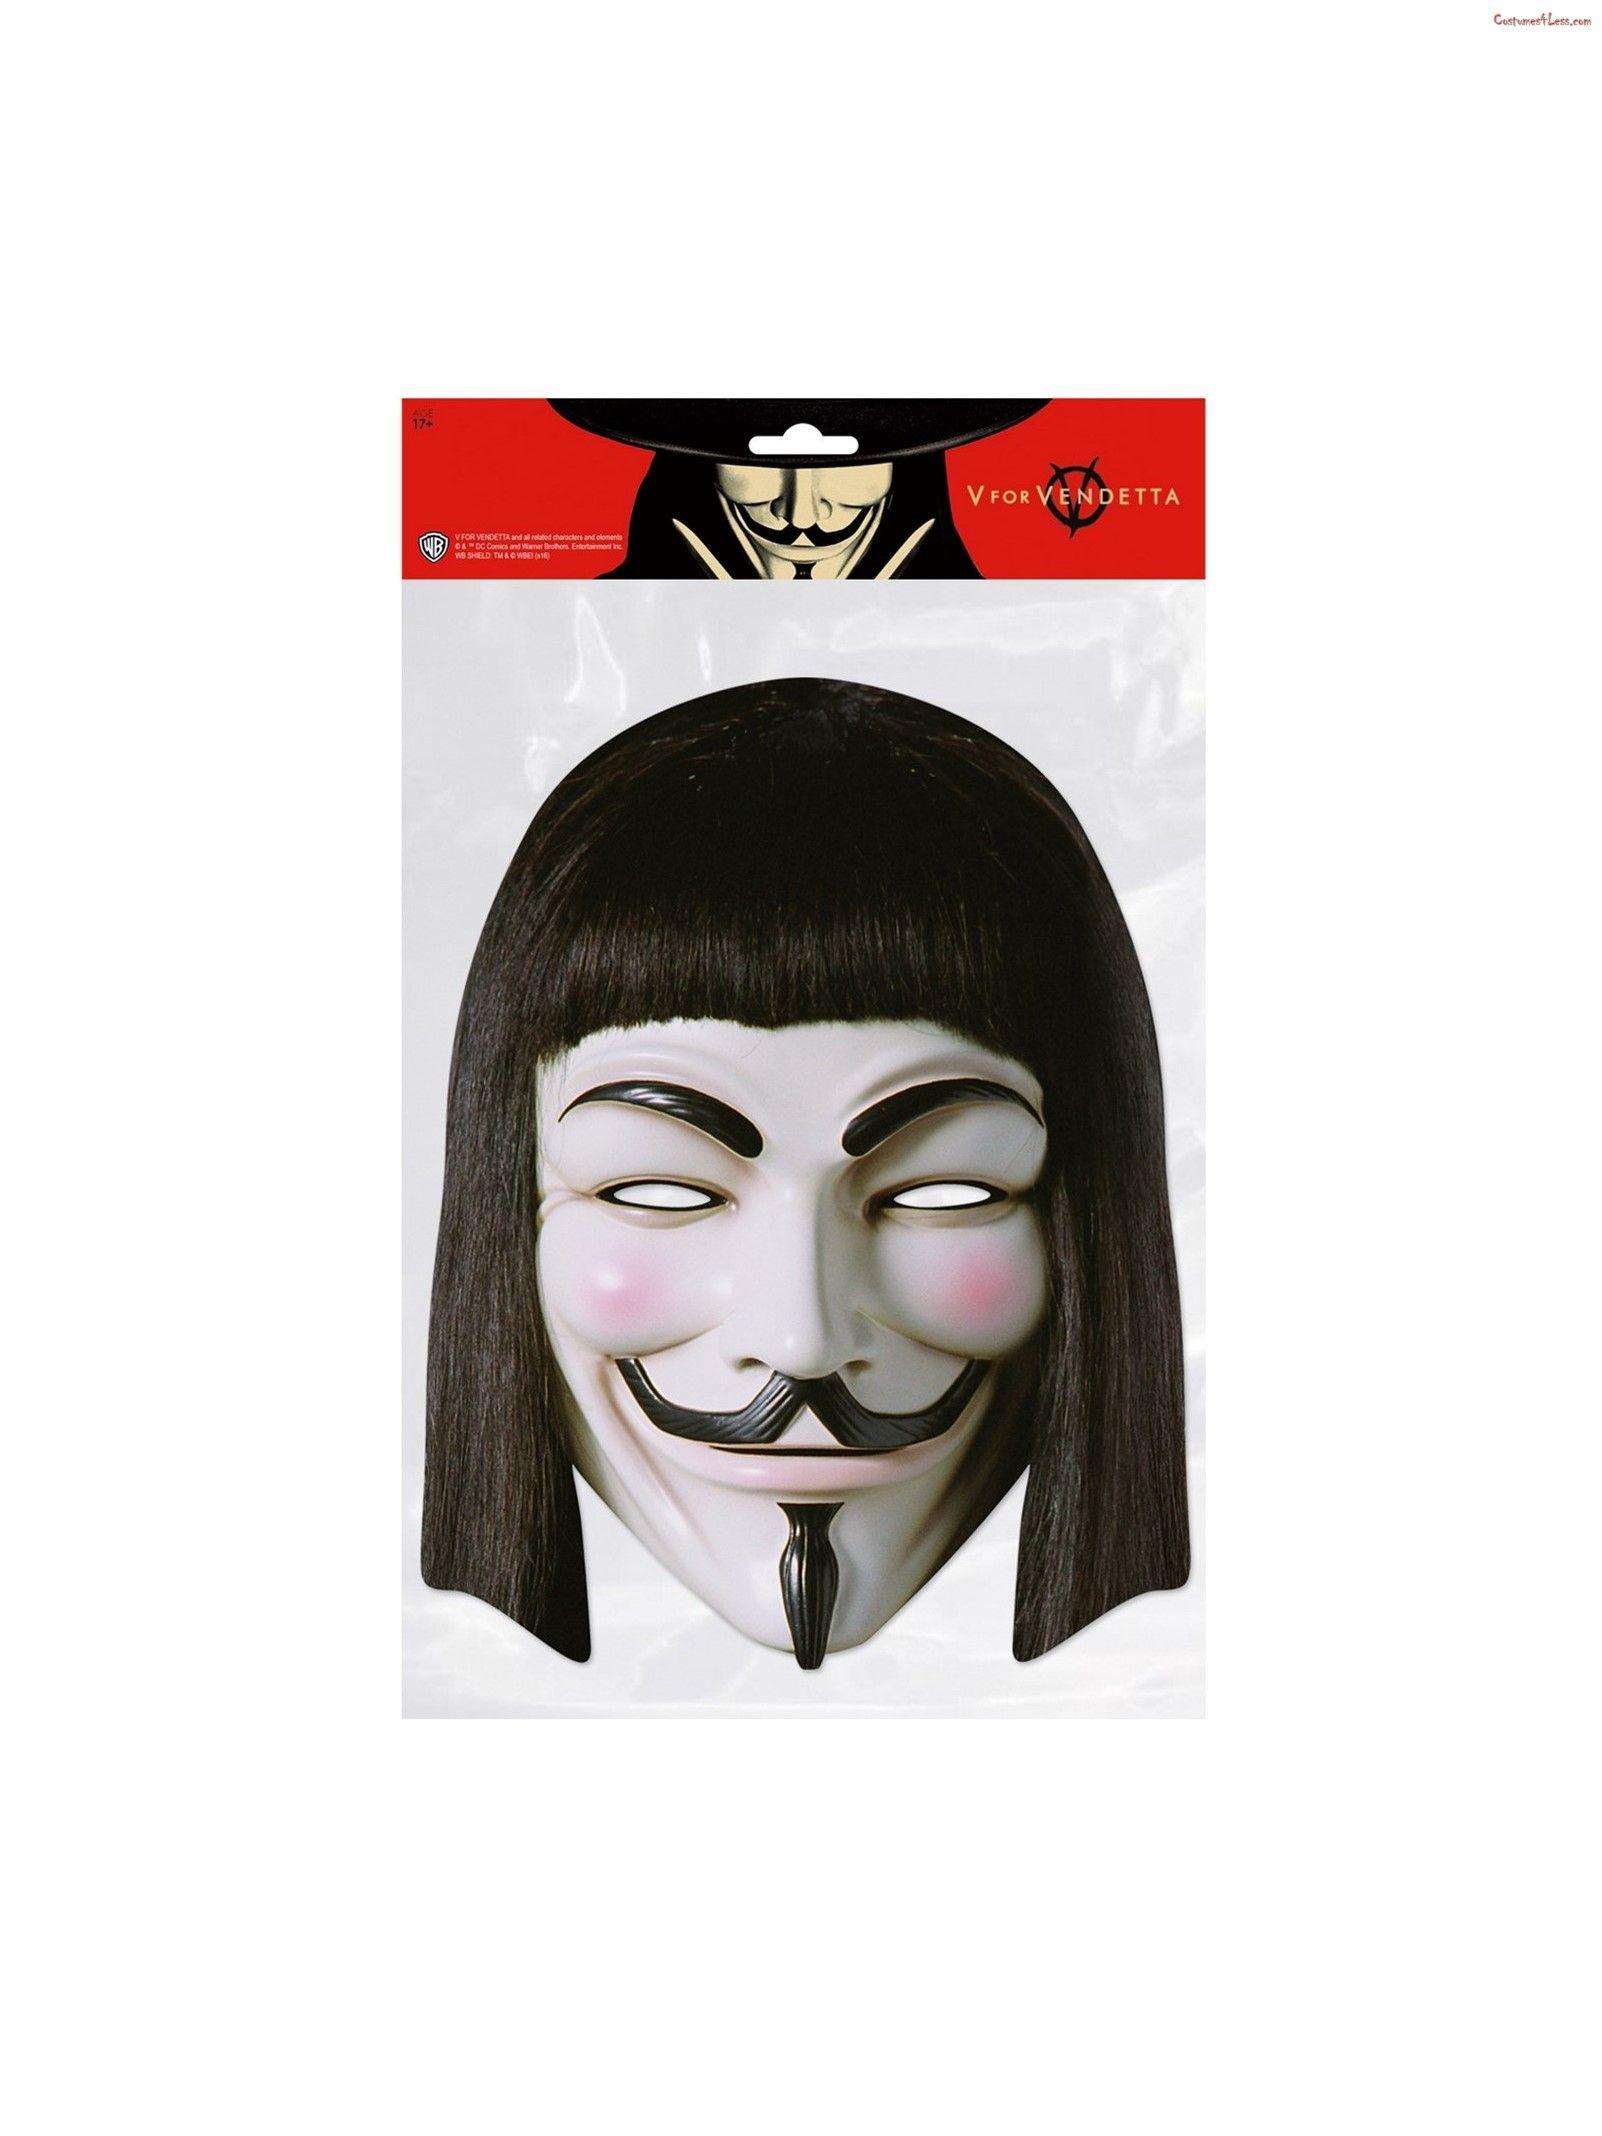 V For Vendetta Facemask Vendetta Facemask V For Vendetta Mask Vendetta Mask V For Vendetta